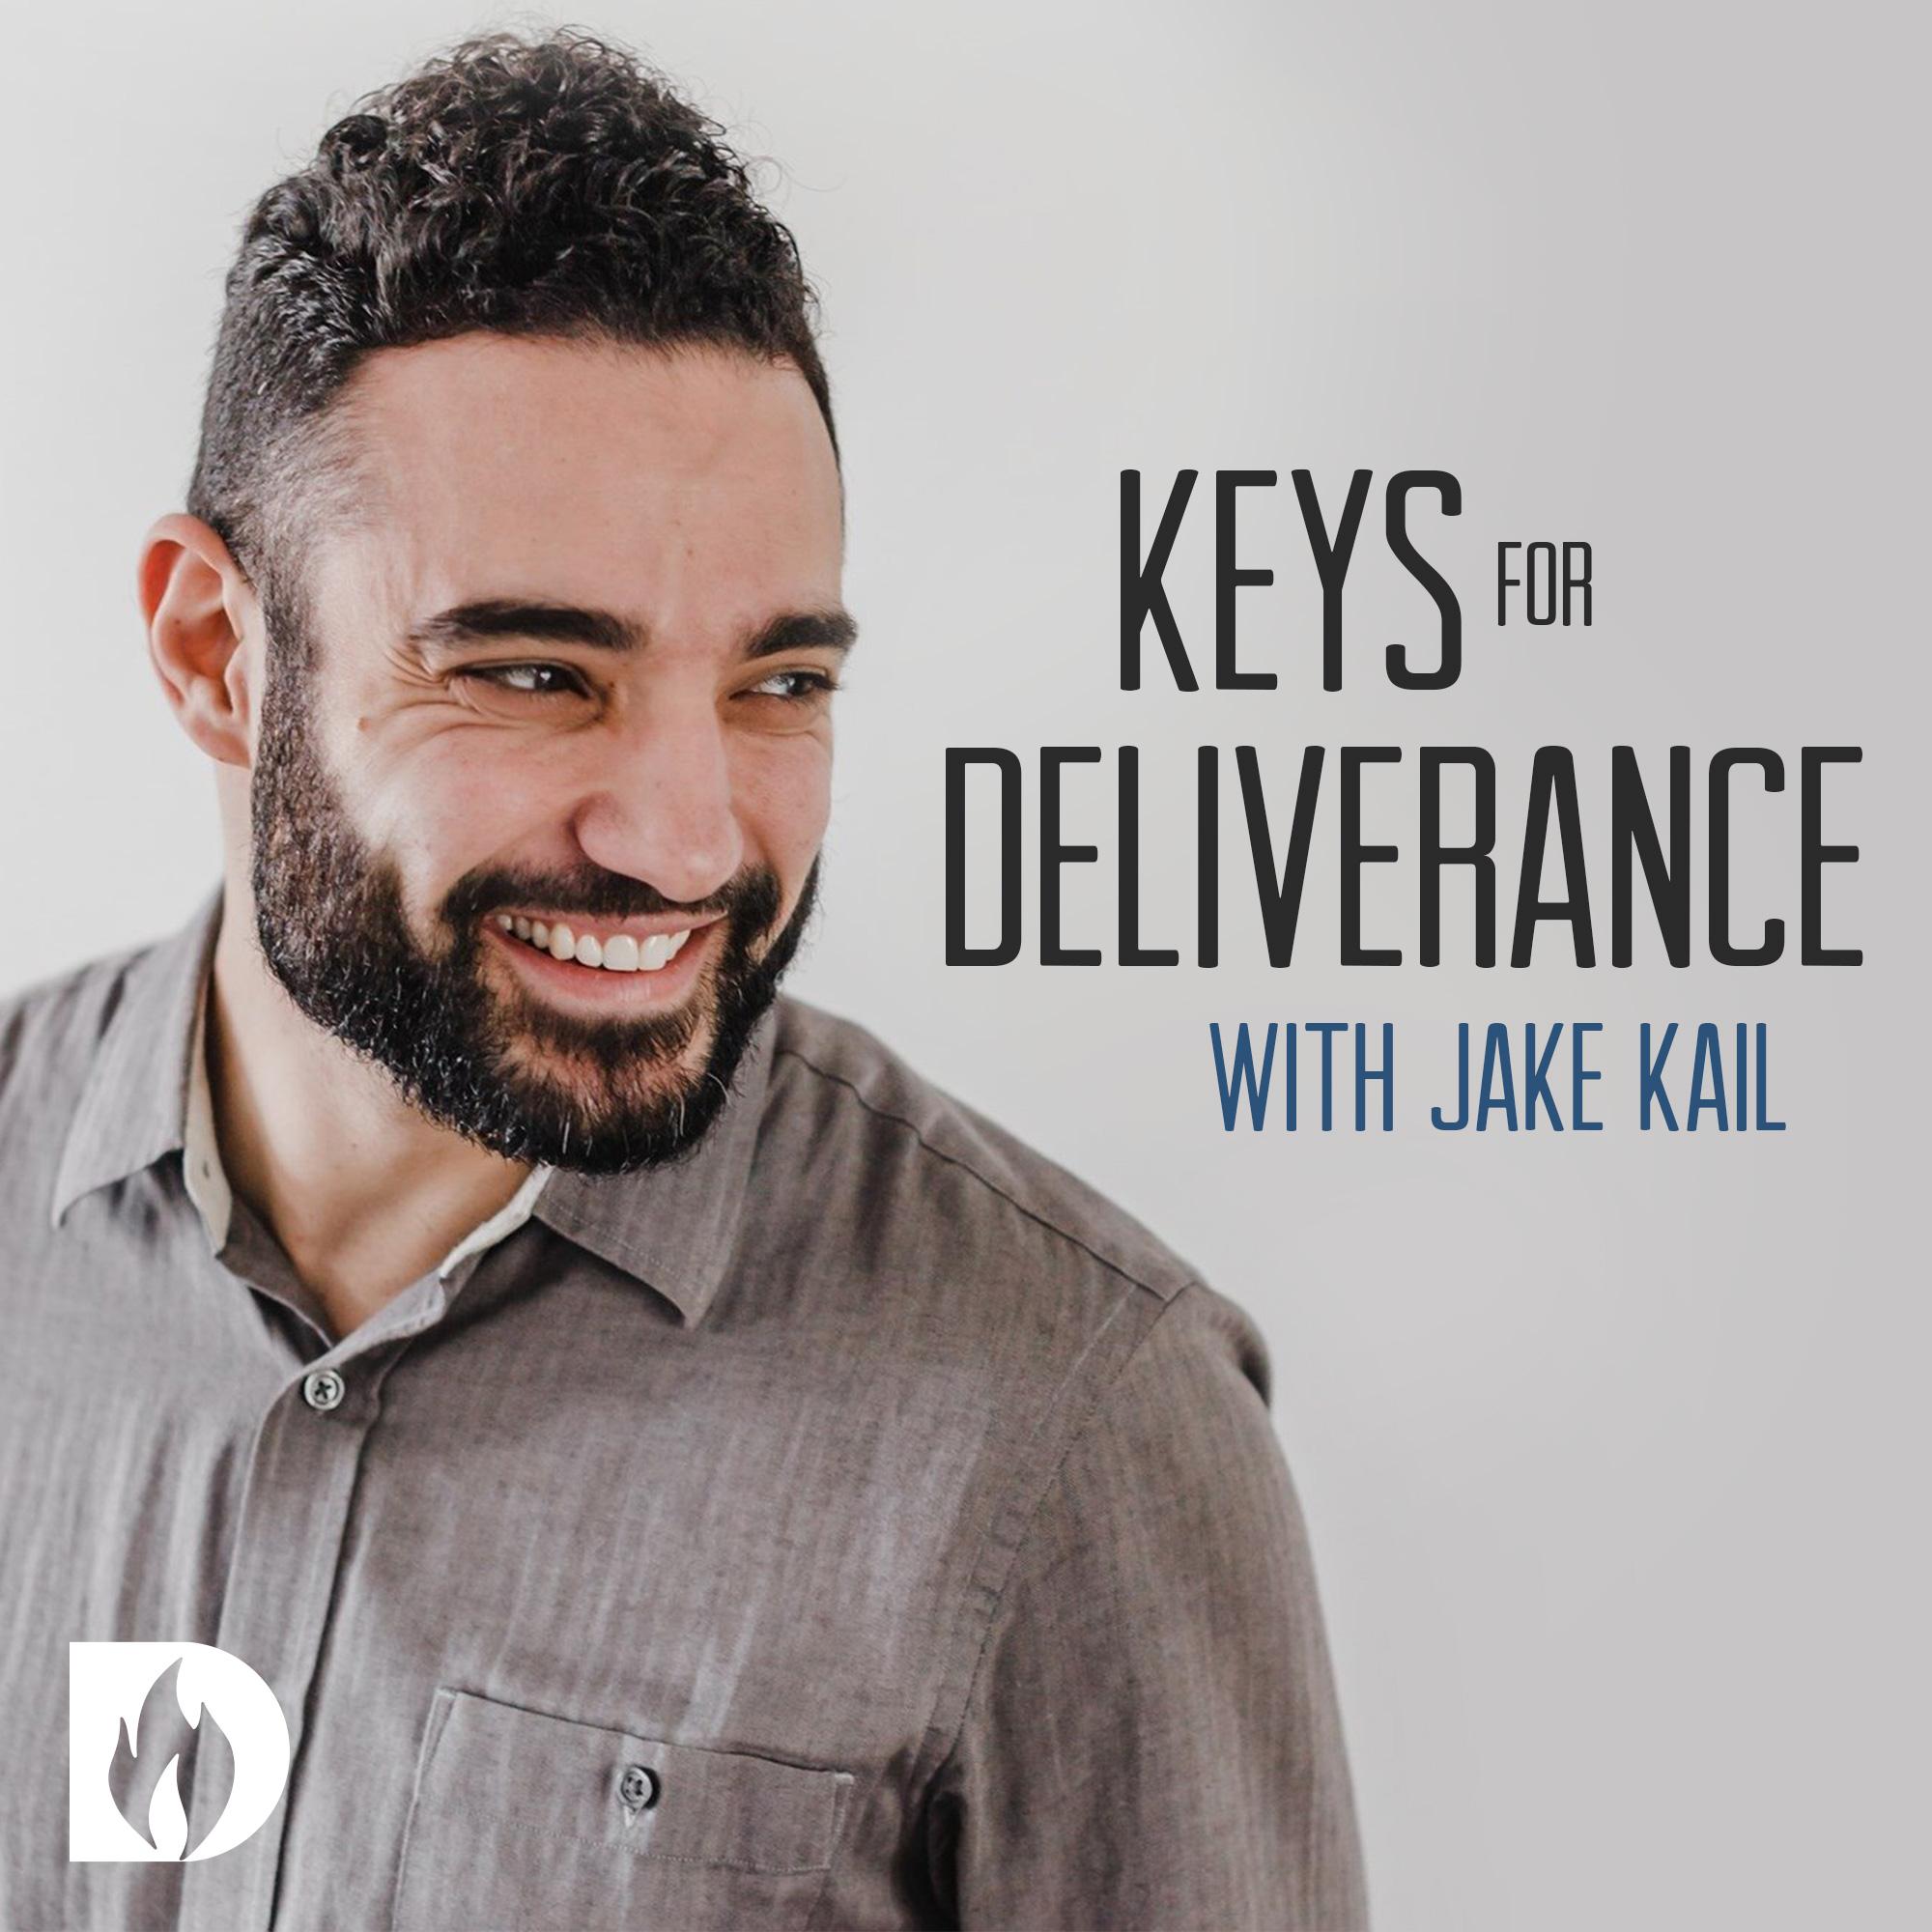 79: Tips for Ministering Deliverance to Children